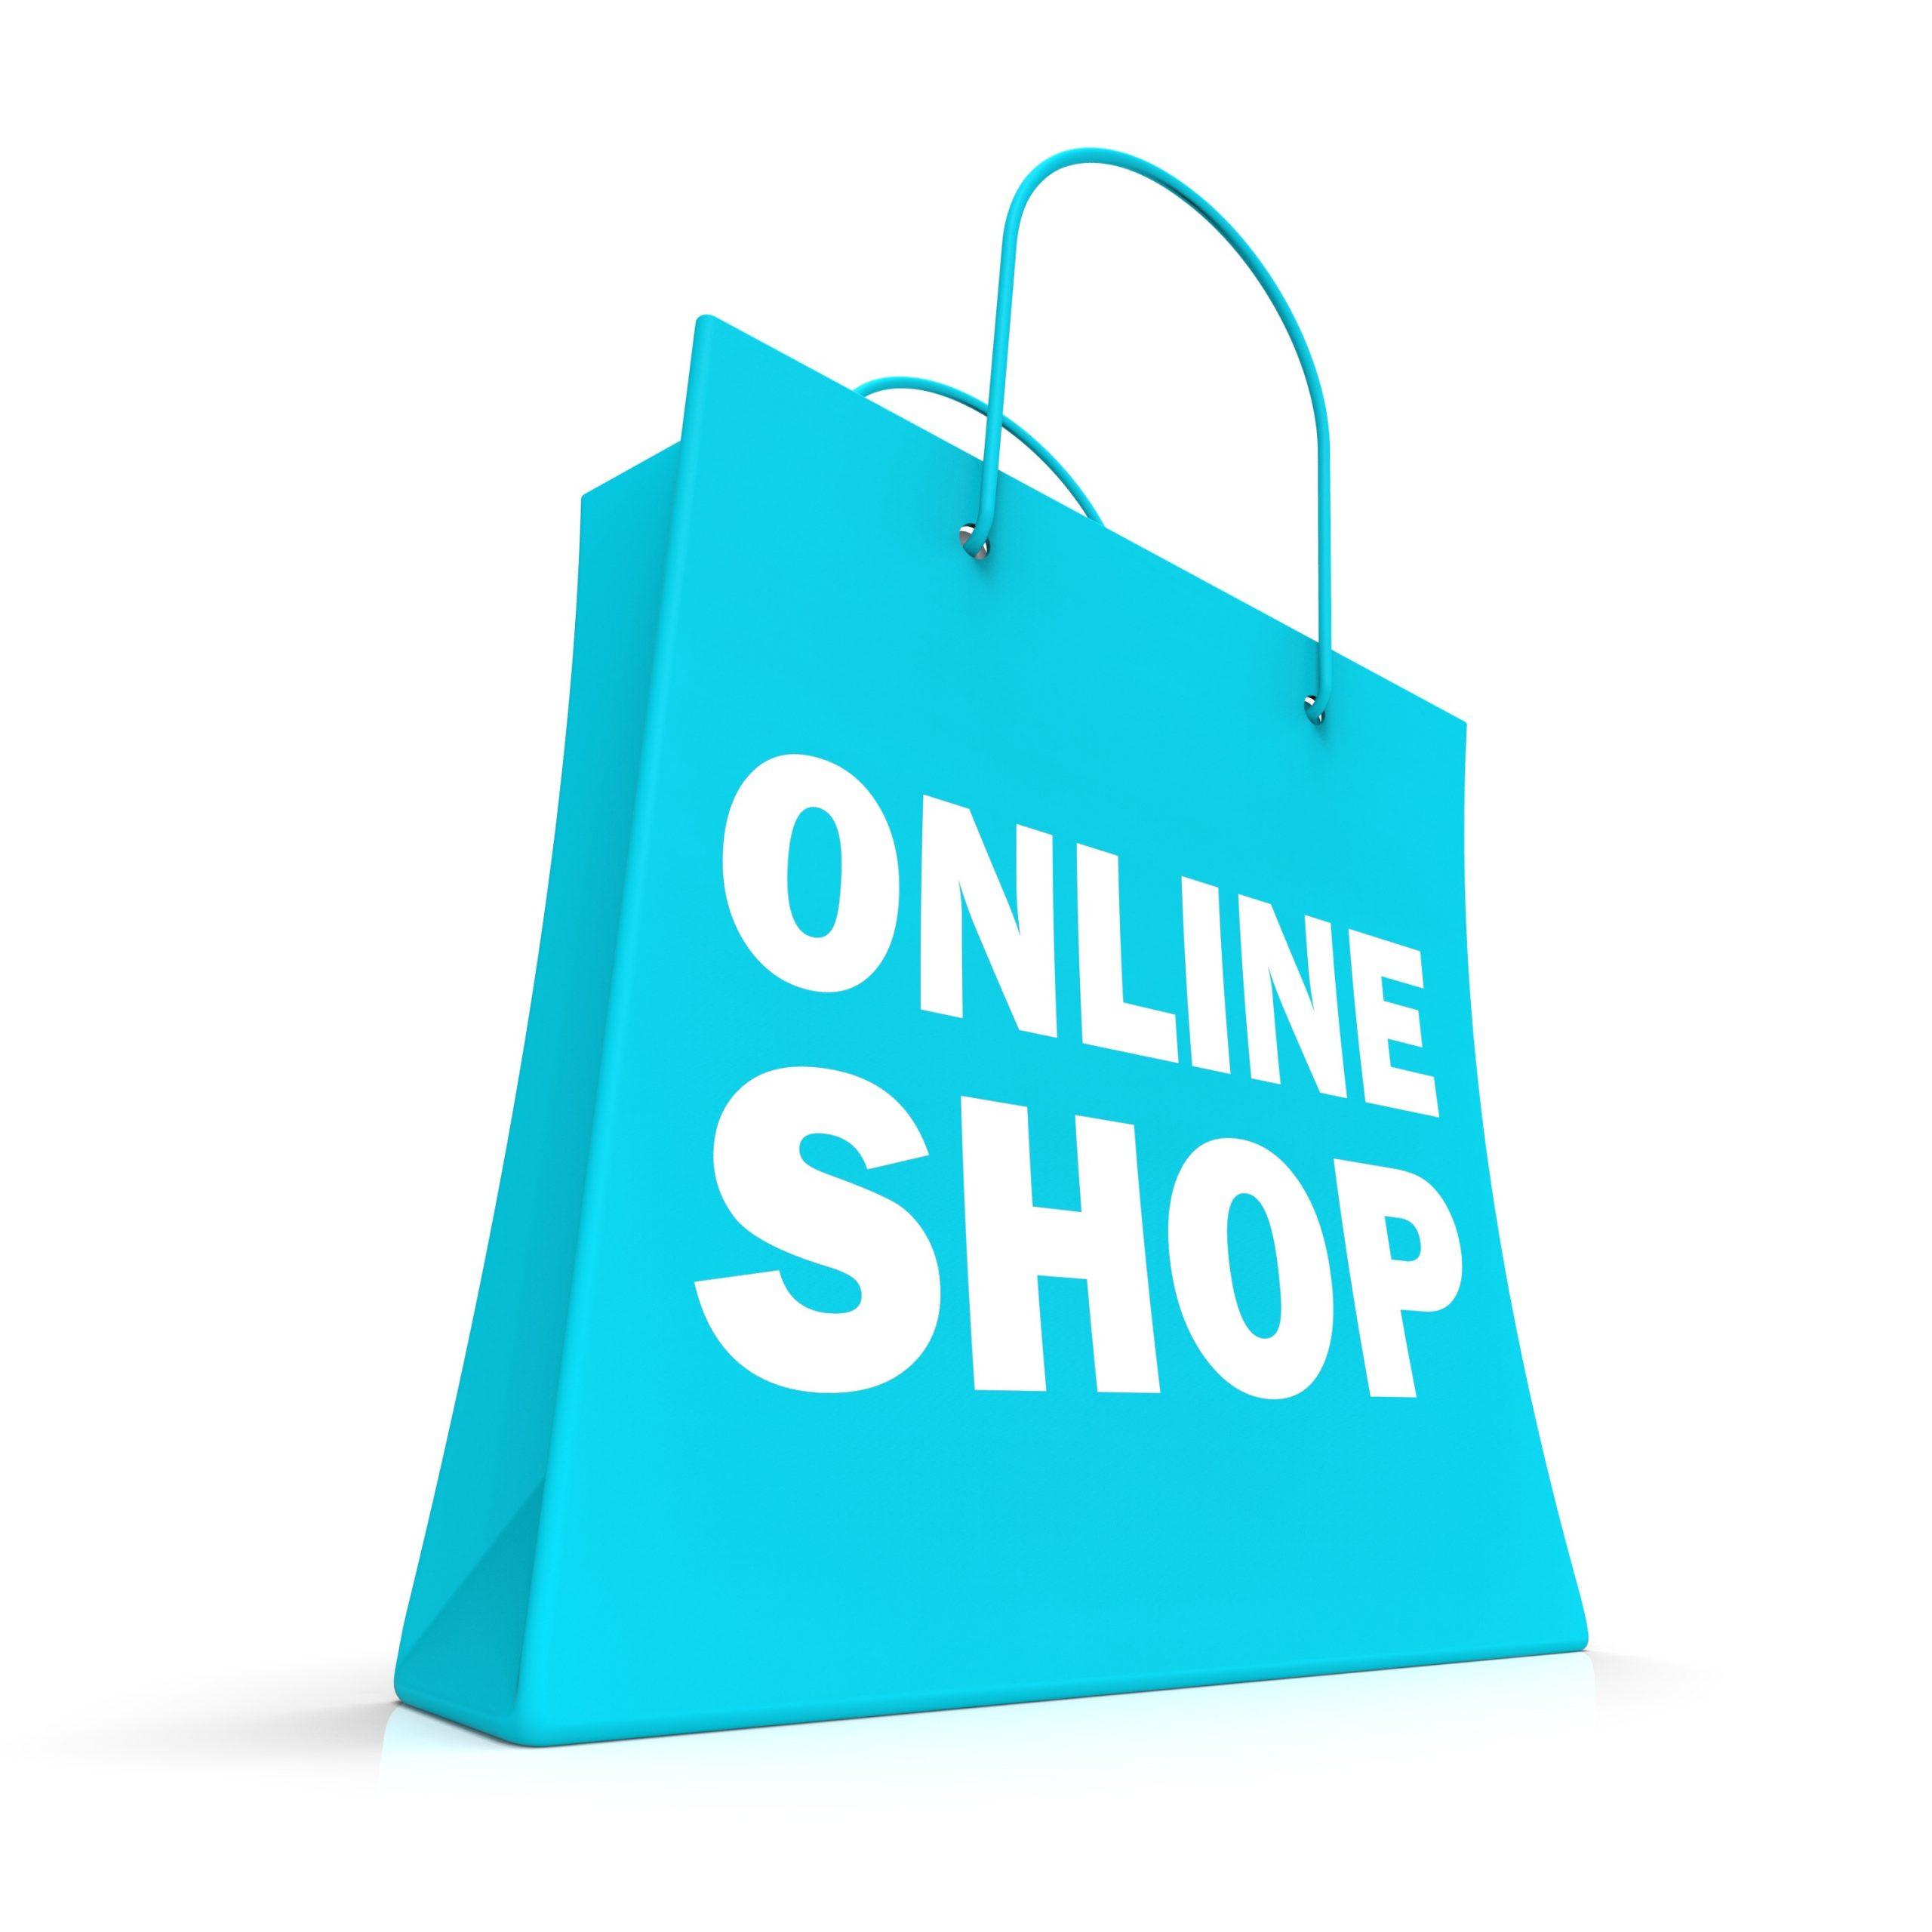 Shopping Online Bag Showing Internet Web Buying